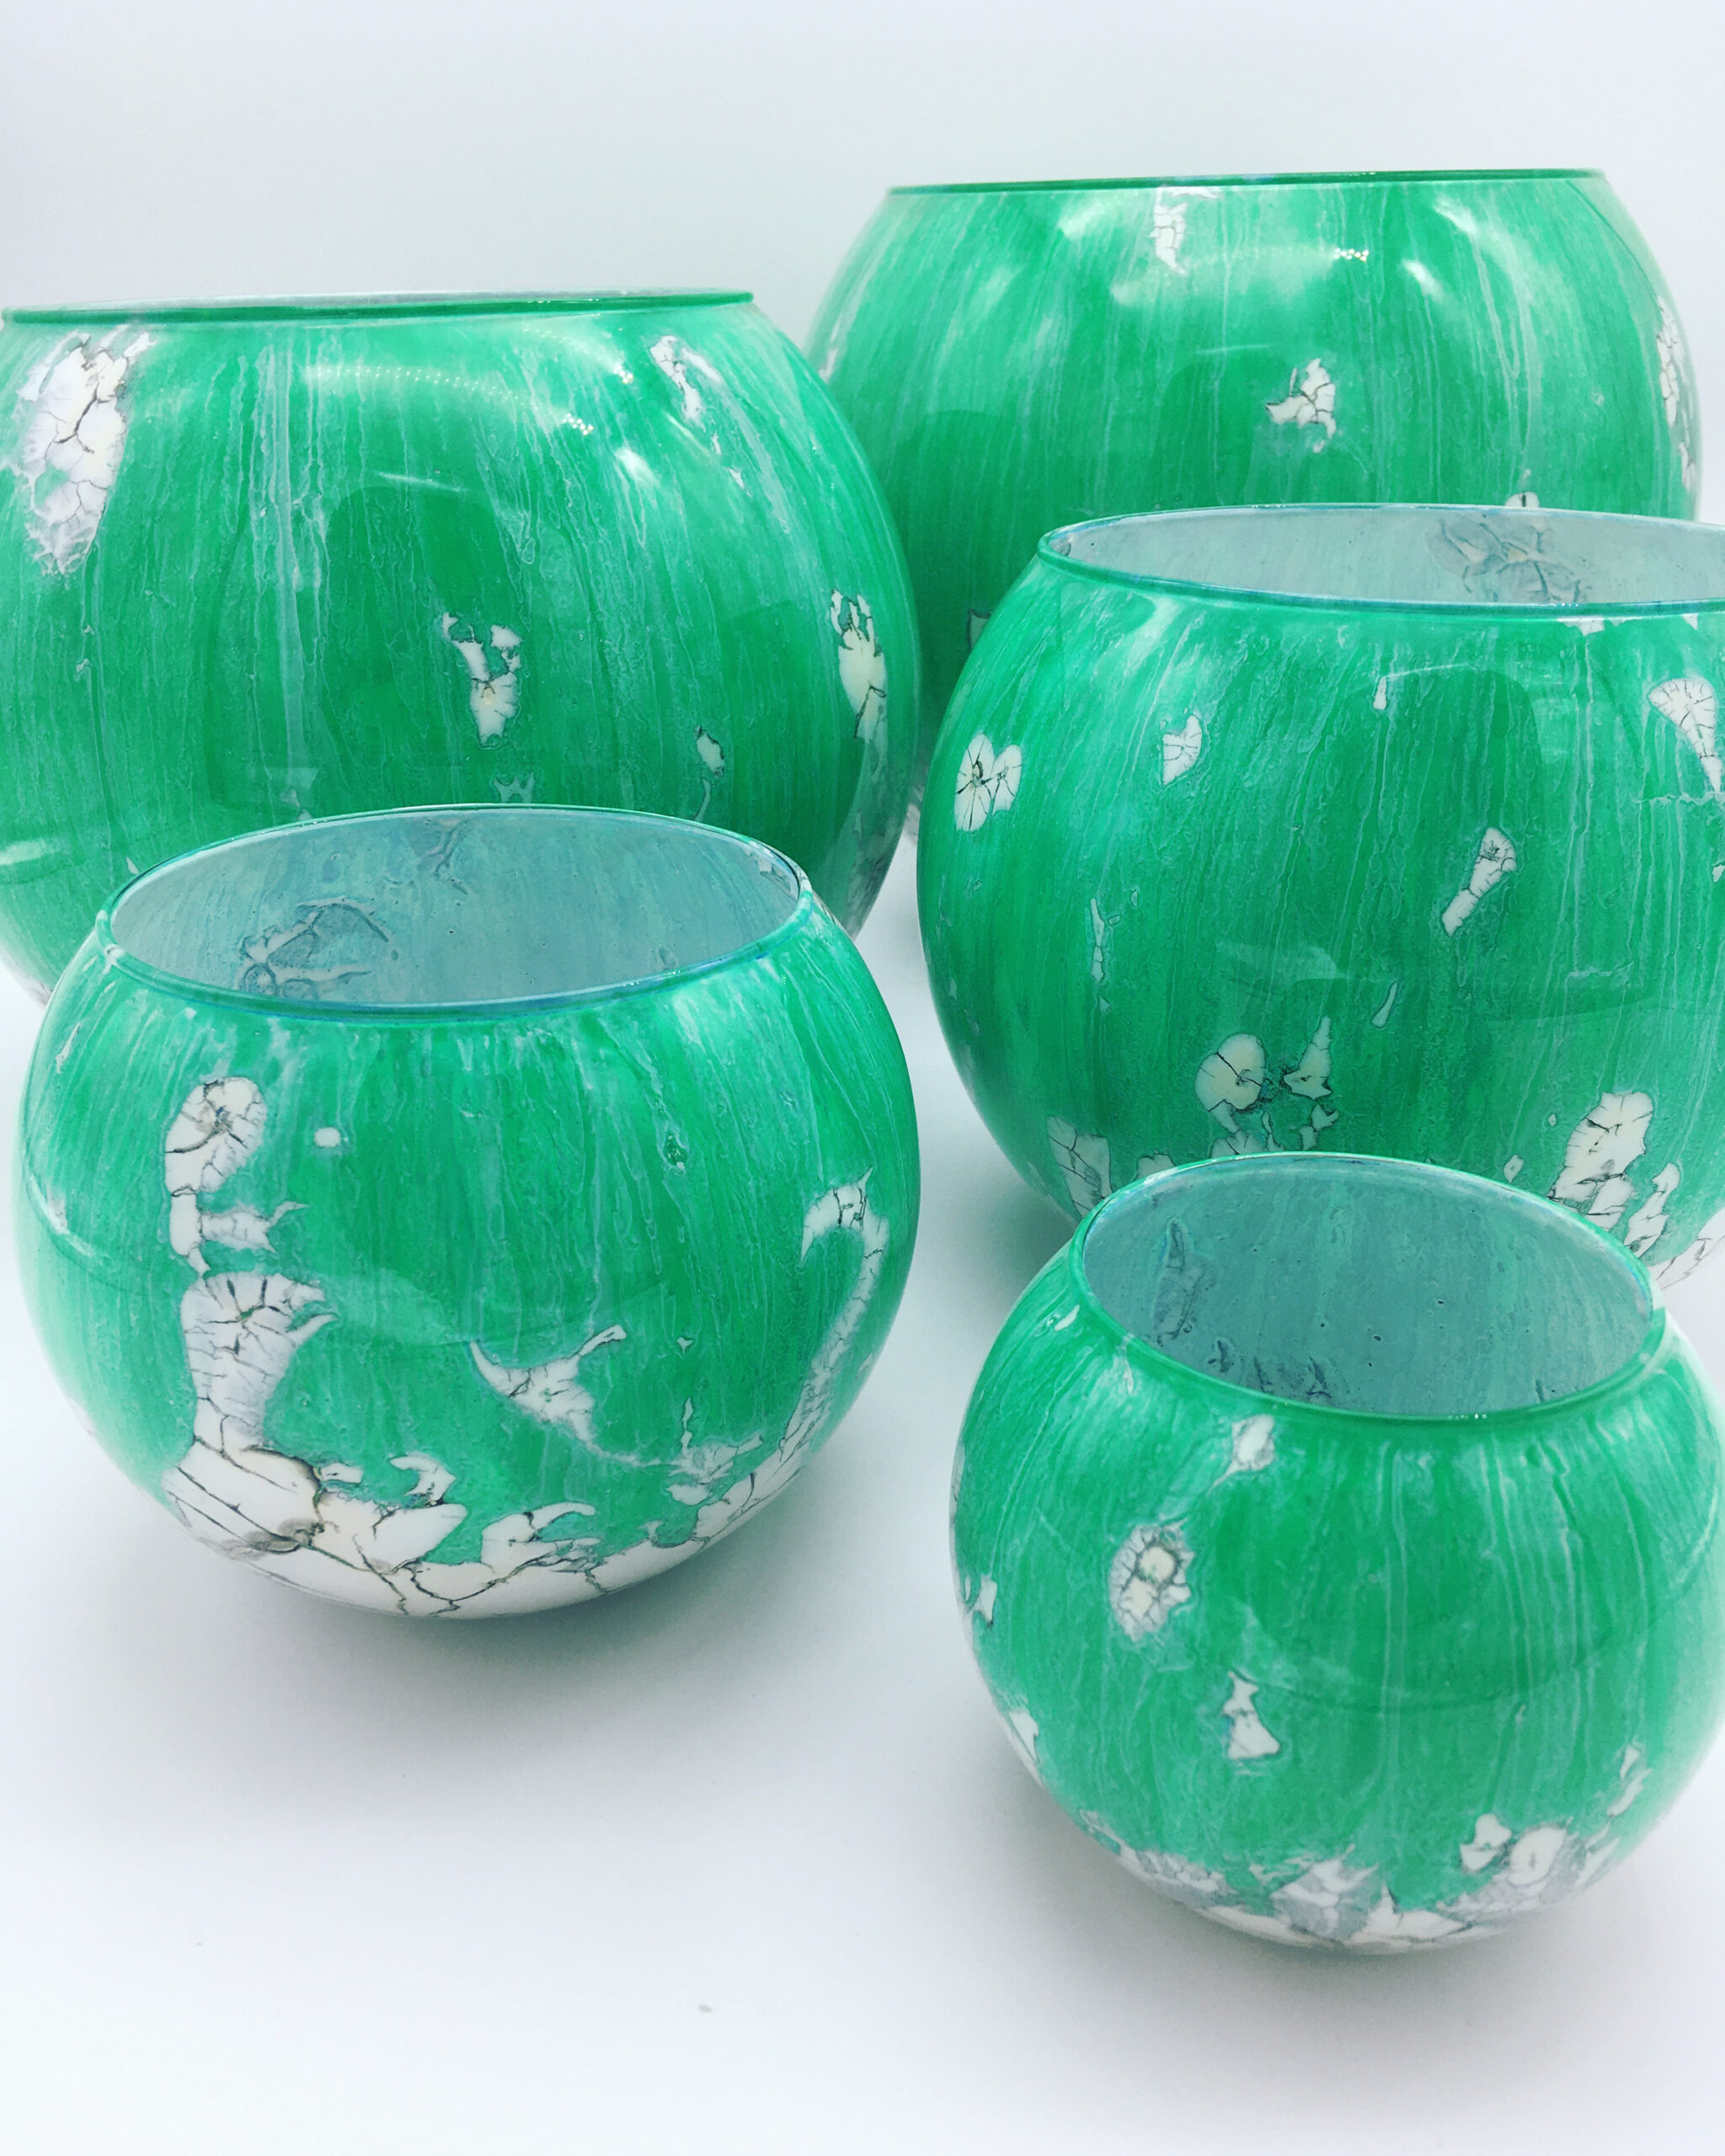 cjs-setoffive-ligtgreenandwhitebowls-handpaintedglass_1080